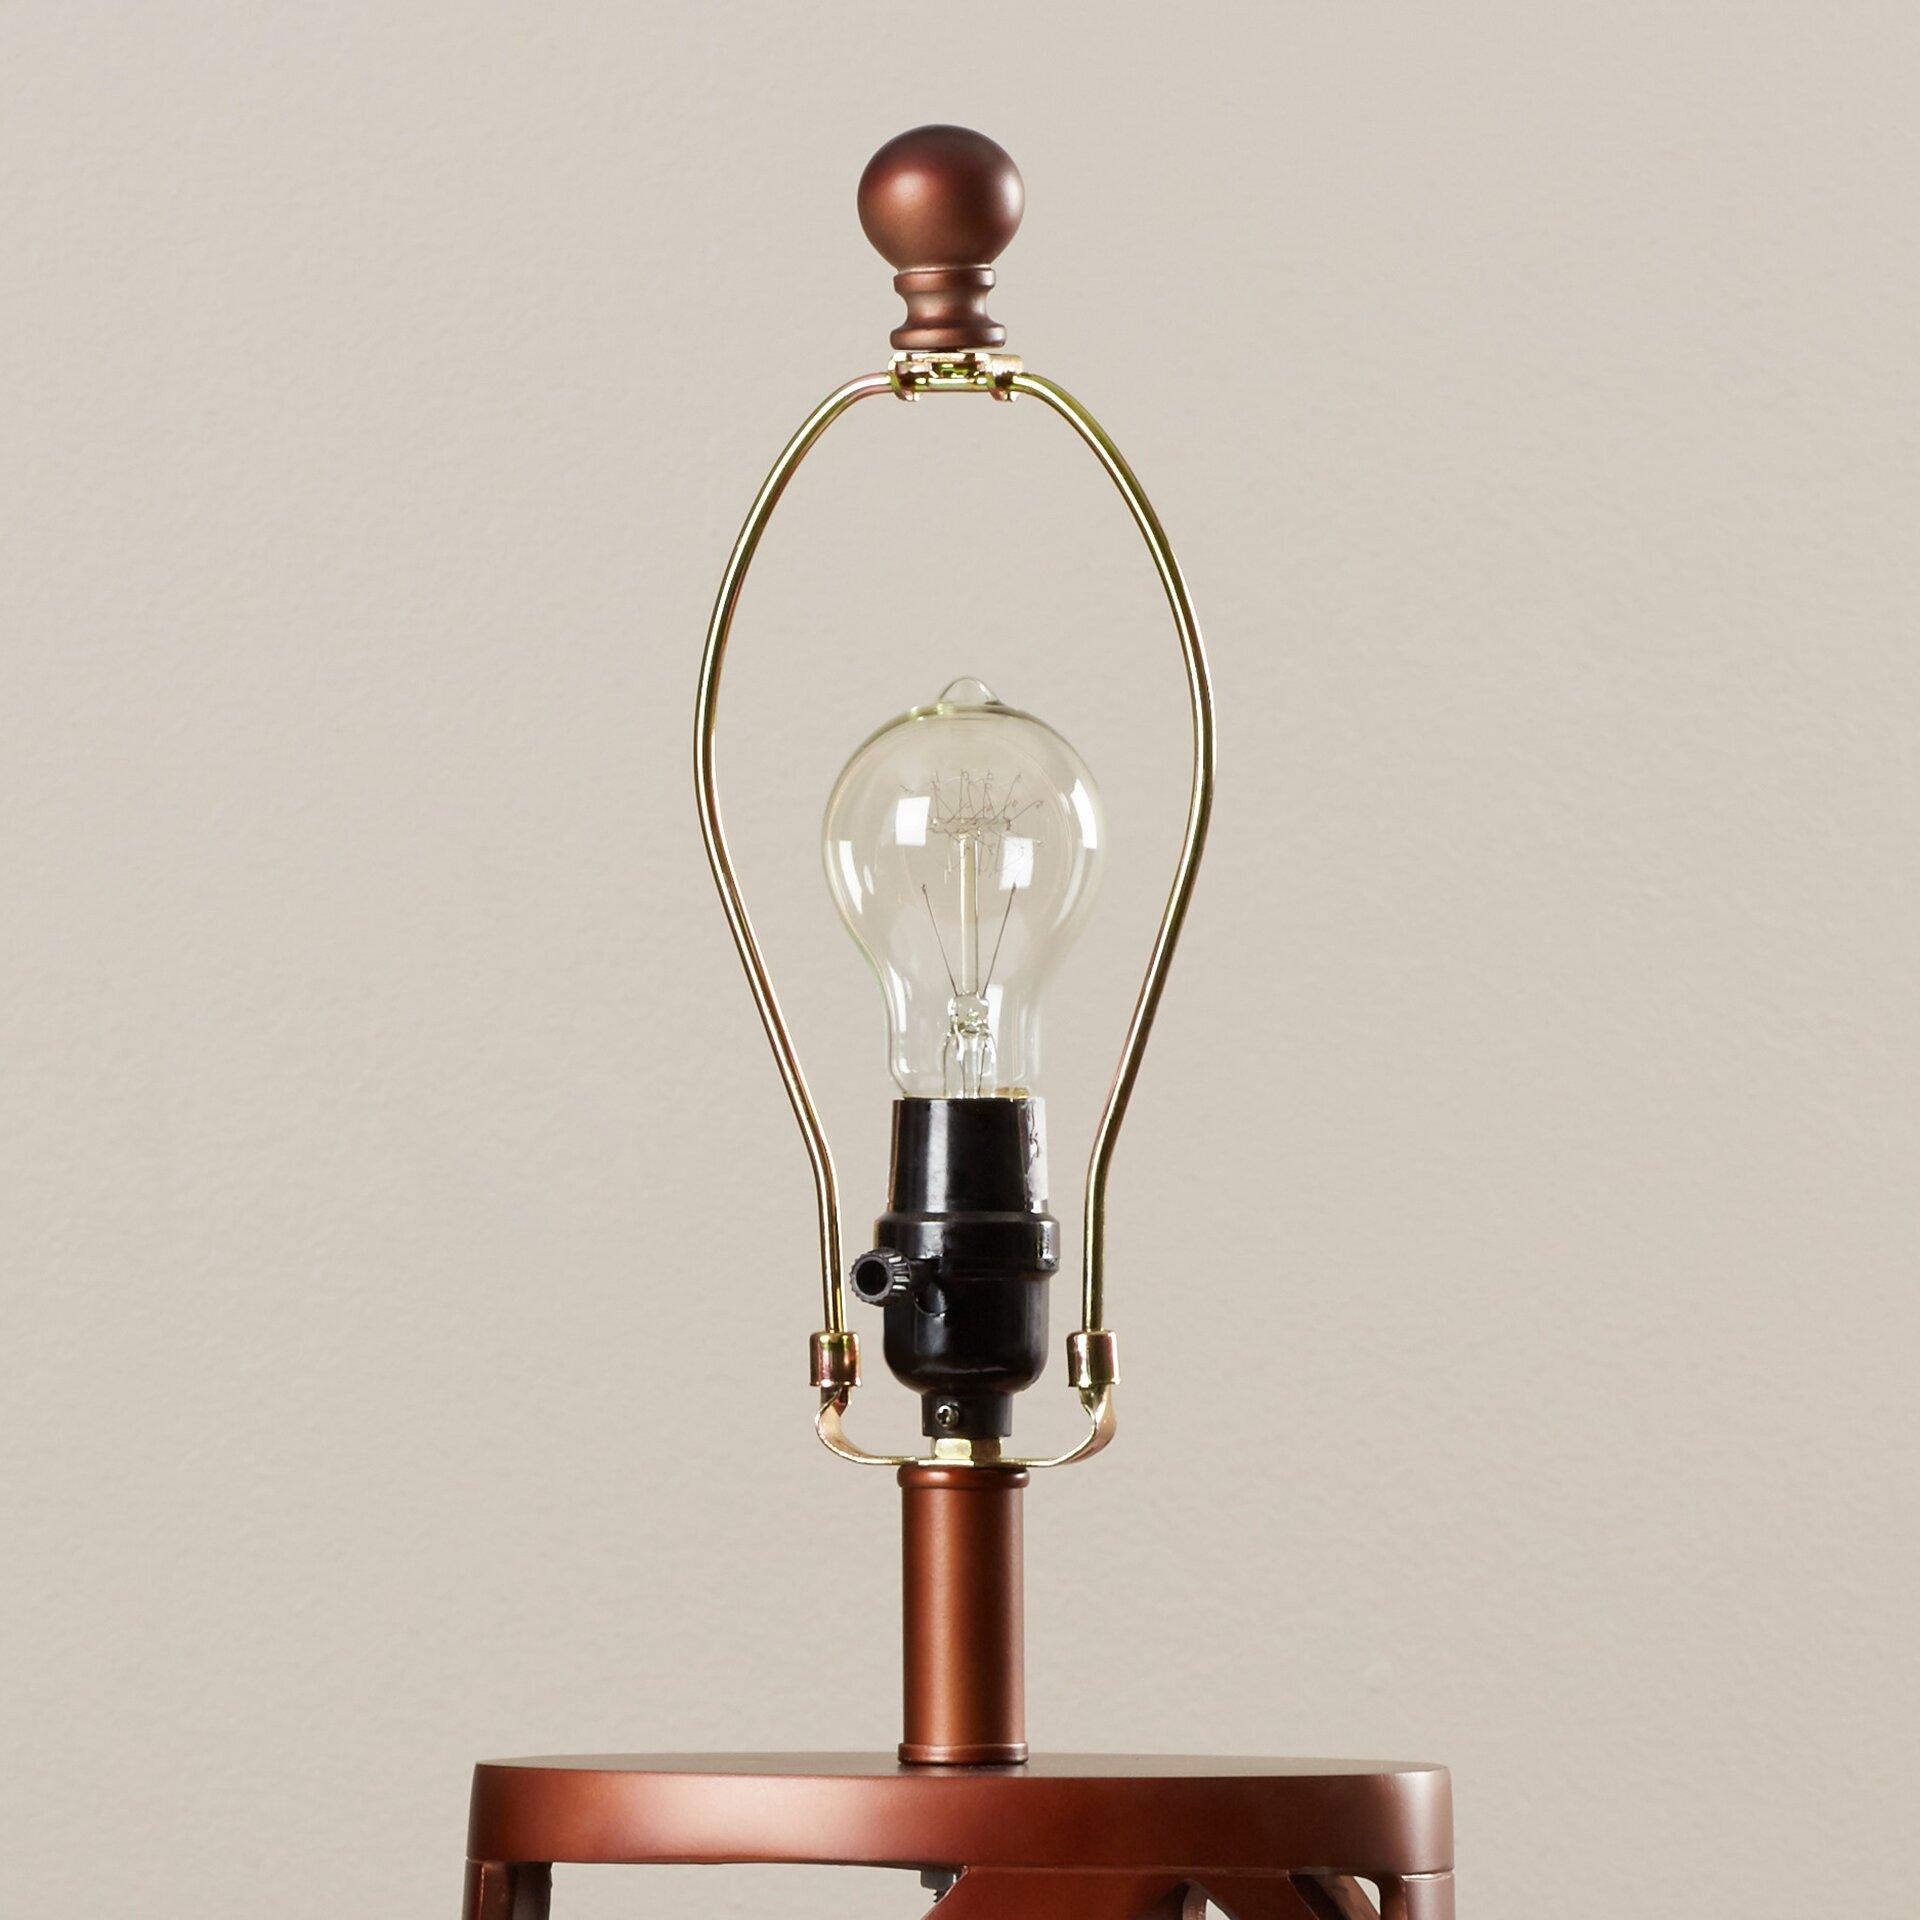 Trent austin design kaulton 25 5 table lamp reviews for Table lamps austin tx